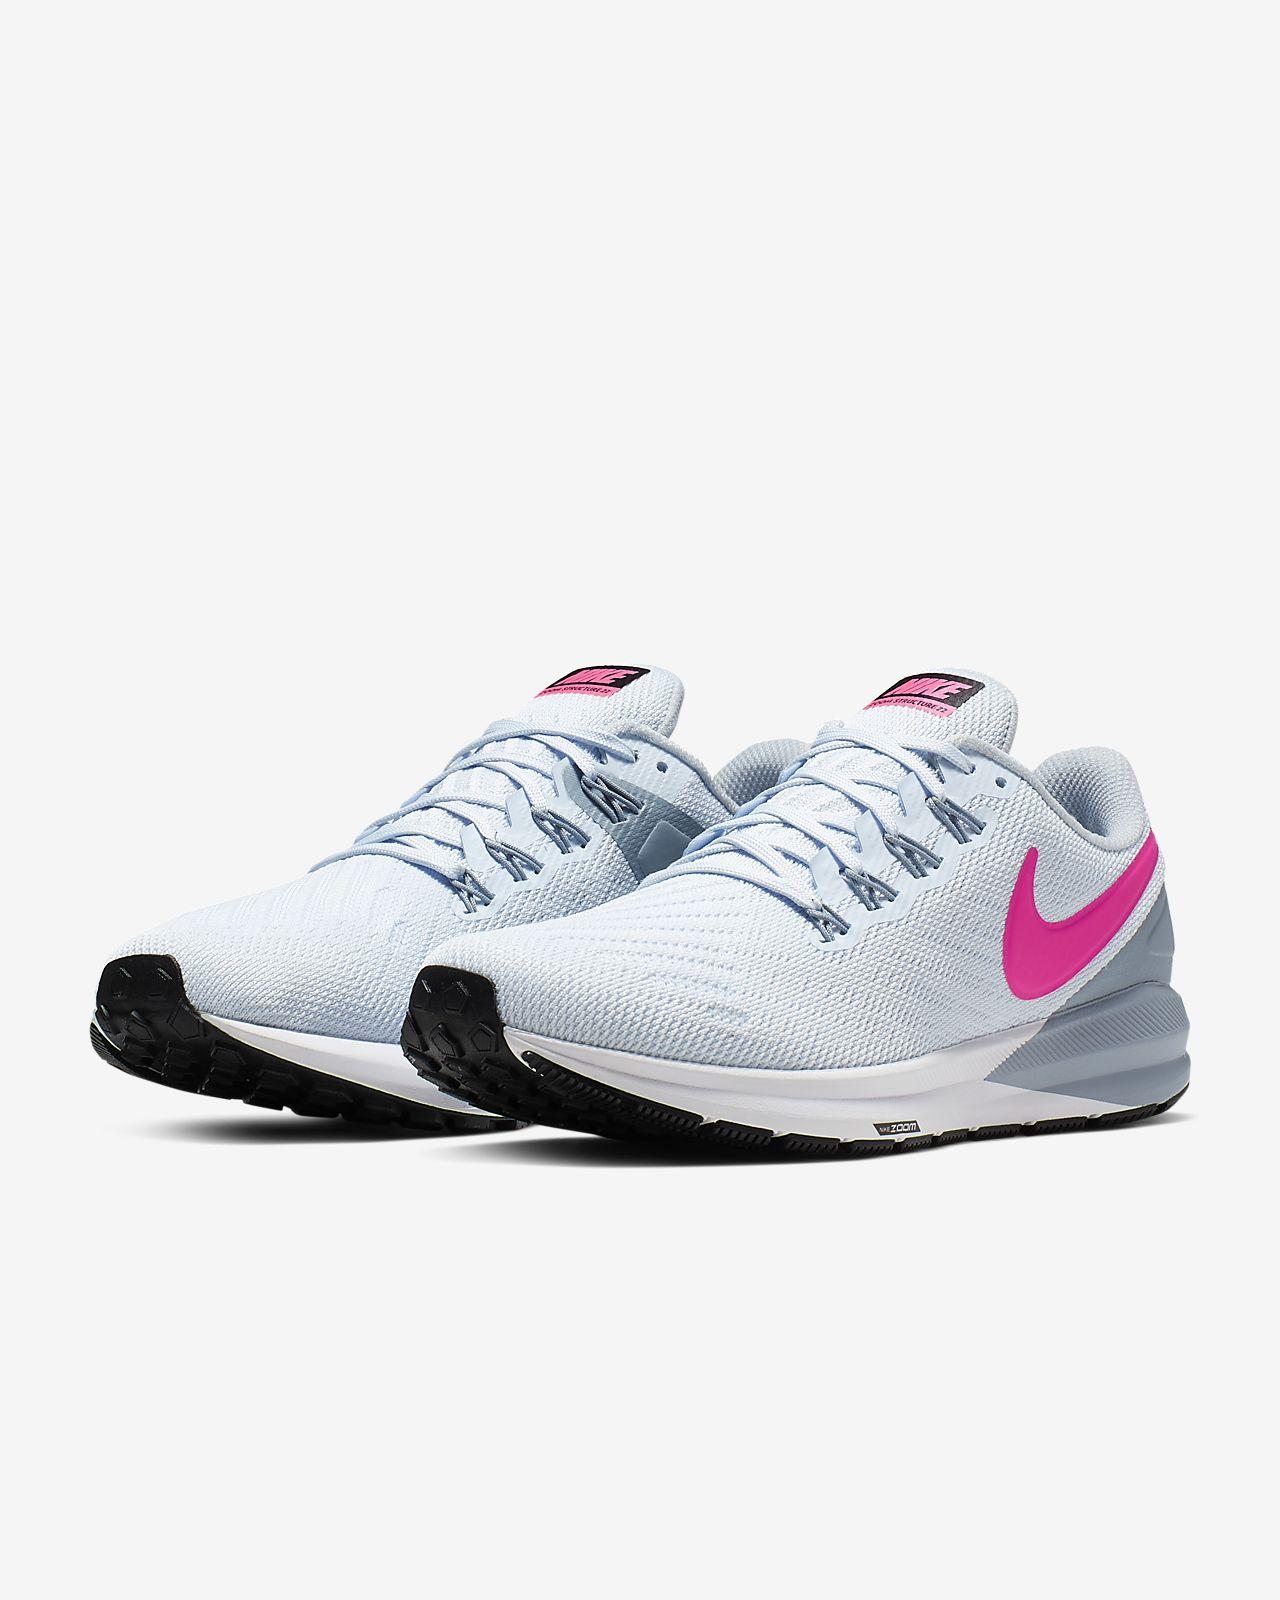 brand new 67664 5cc83 Nike Air Zoom Structure 22 Women's Running Shoe